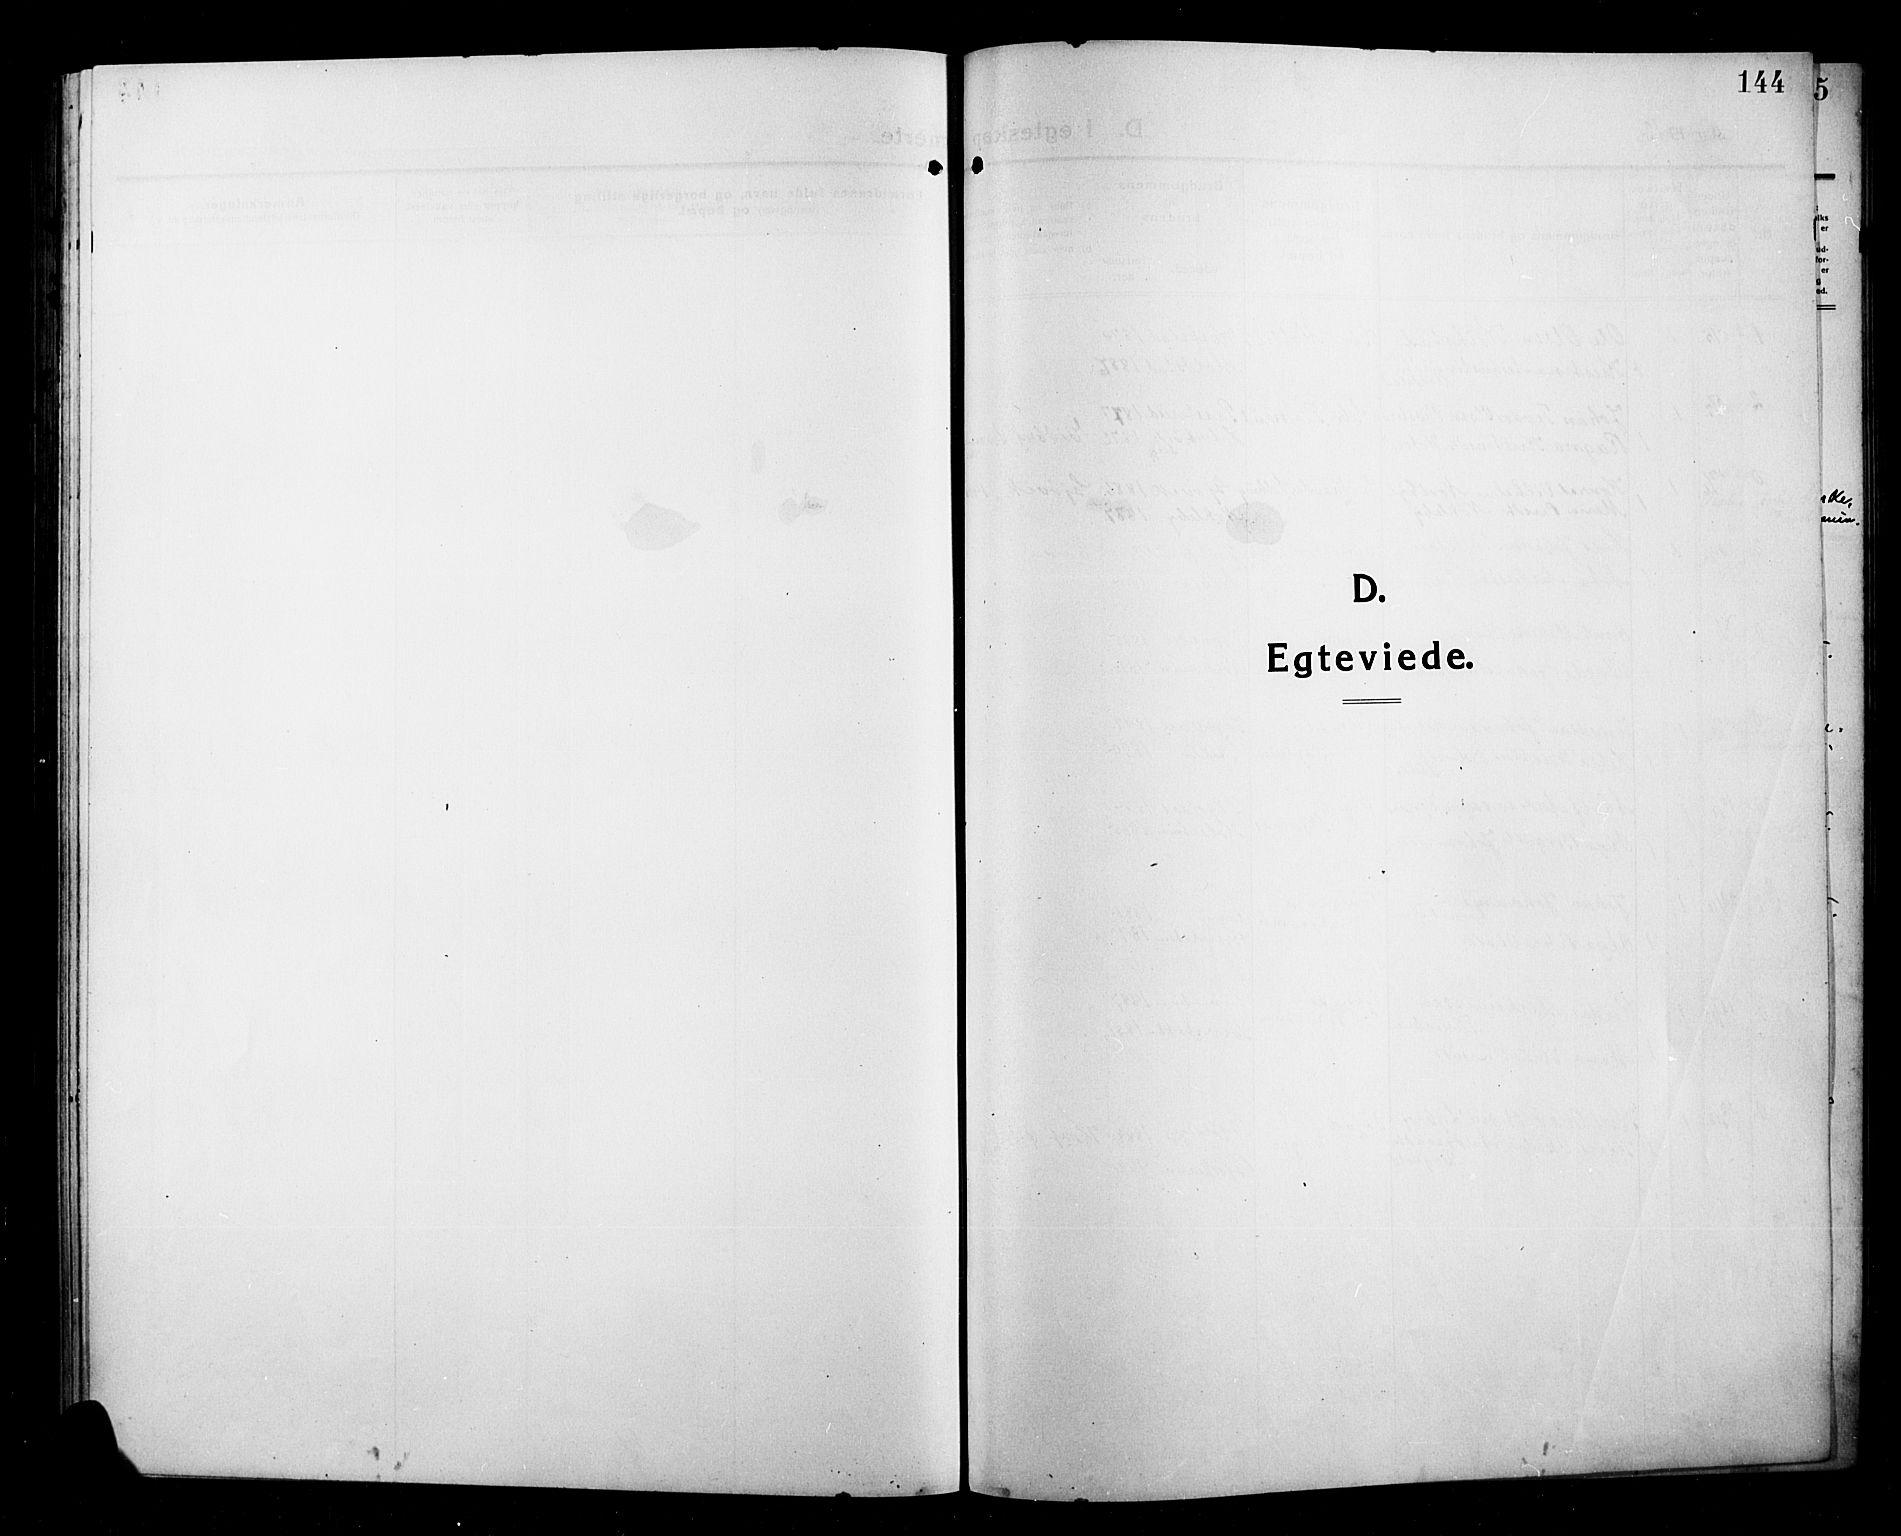 SAH, Kolbu prestekontor, Klokkerbok nr. 1, 1912-1925, s. 144